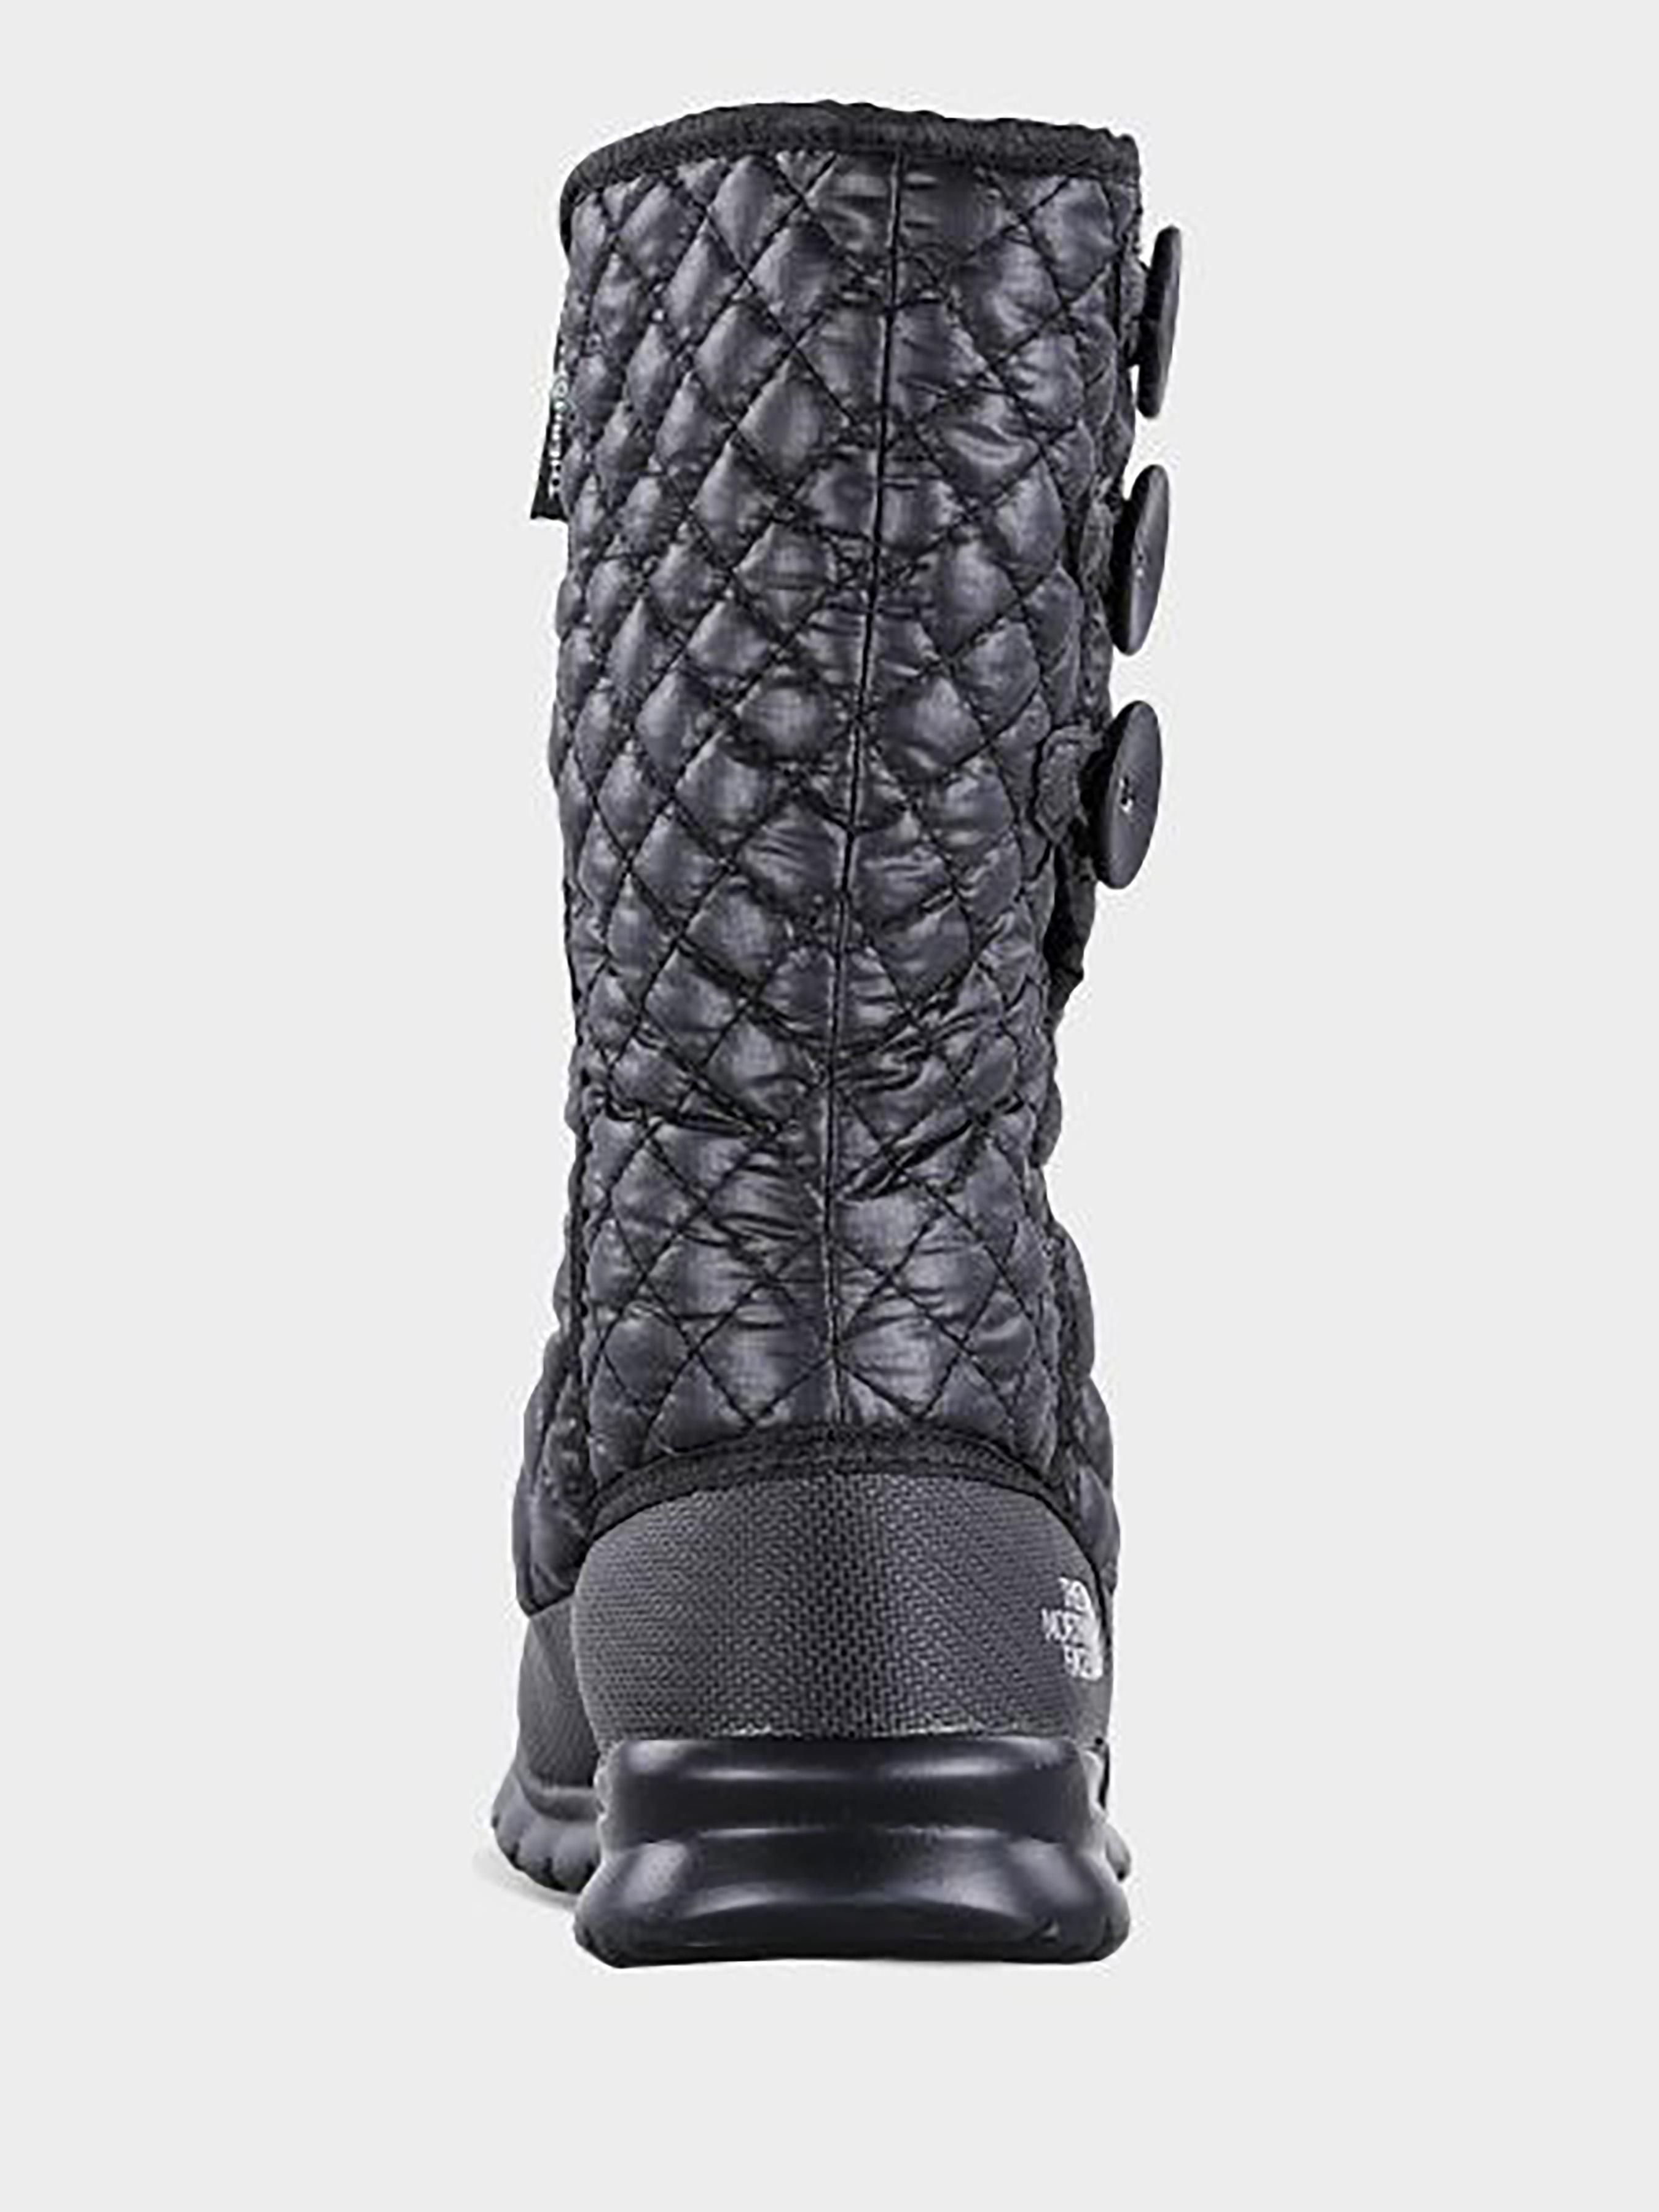 Сапоги для женщин The North Face ThermoBall™ Button-Up NO9795 примерка, 2017